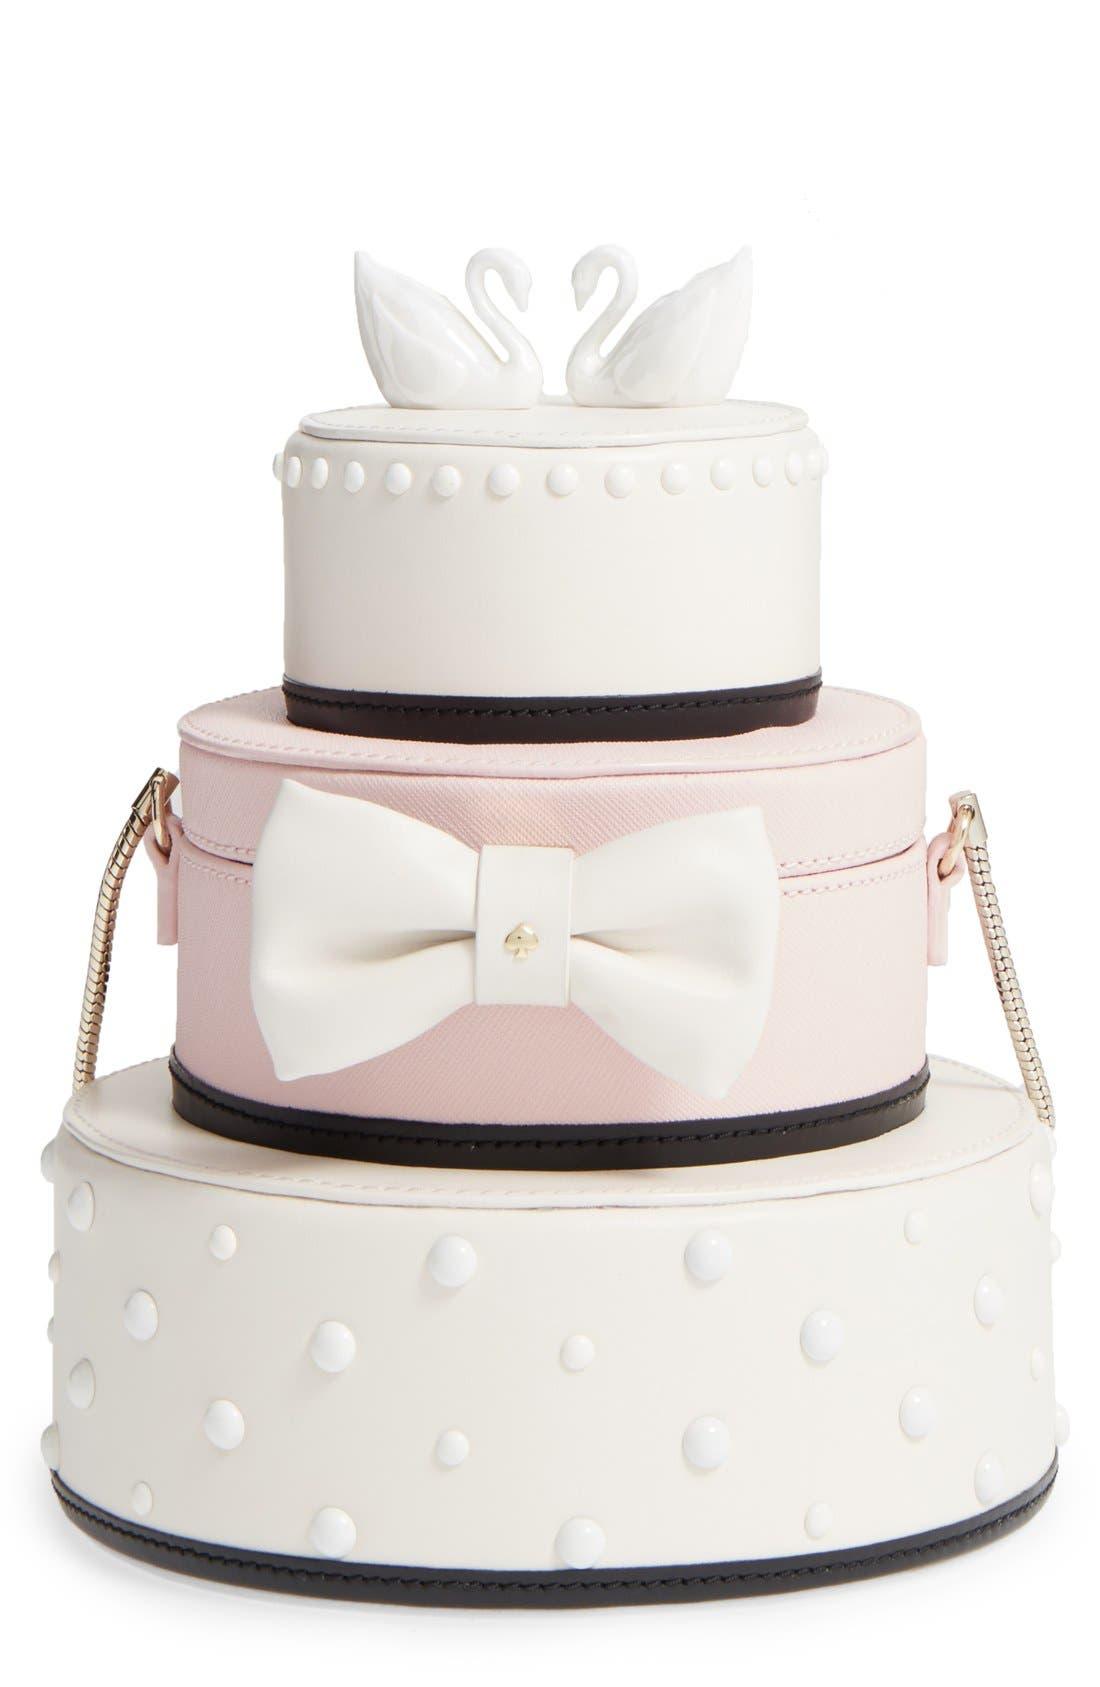 Alternate Image 1 Selected - kate spade new york 'wedding belles - cake' leather handbag